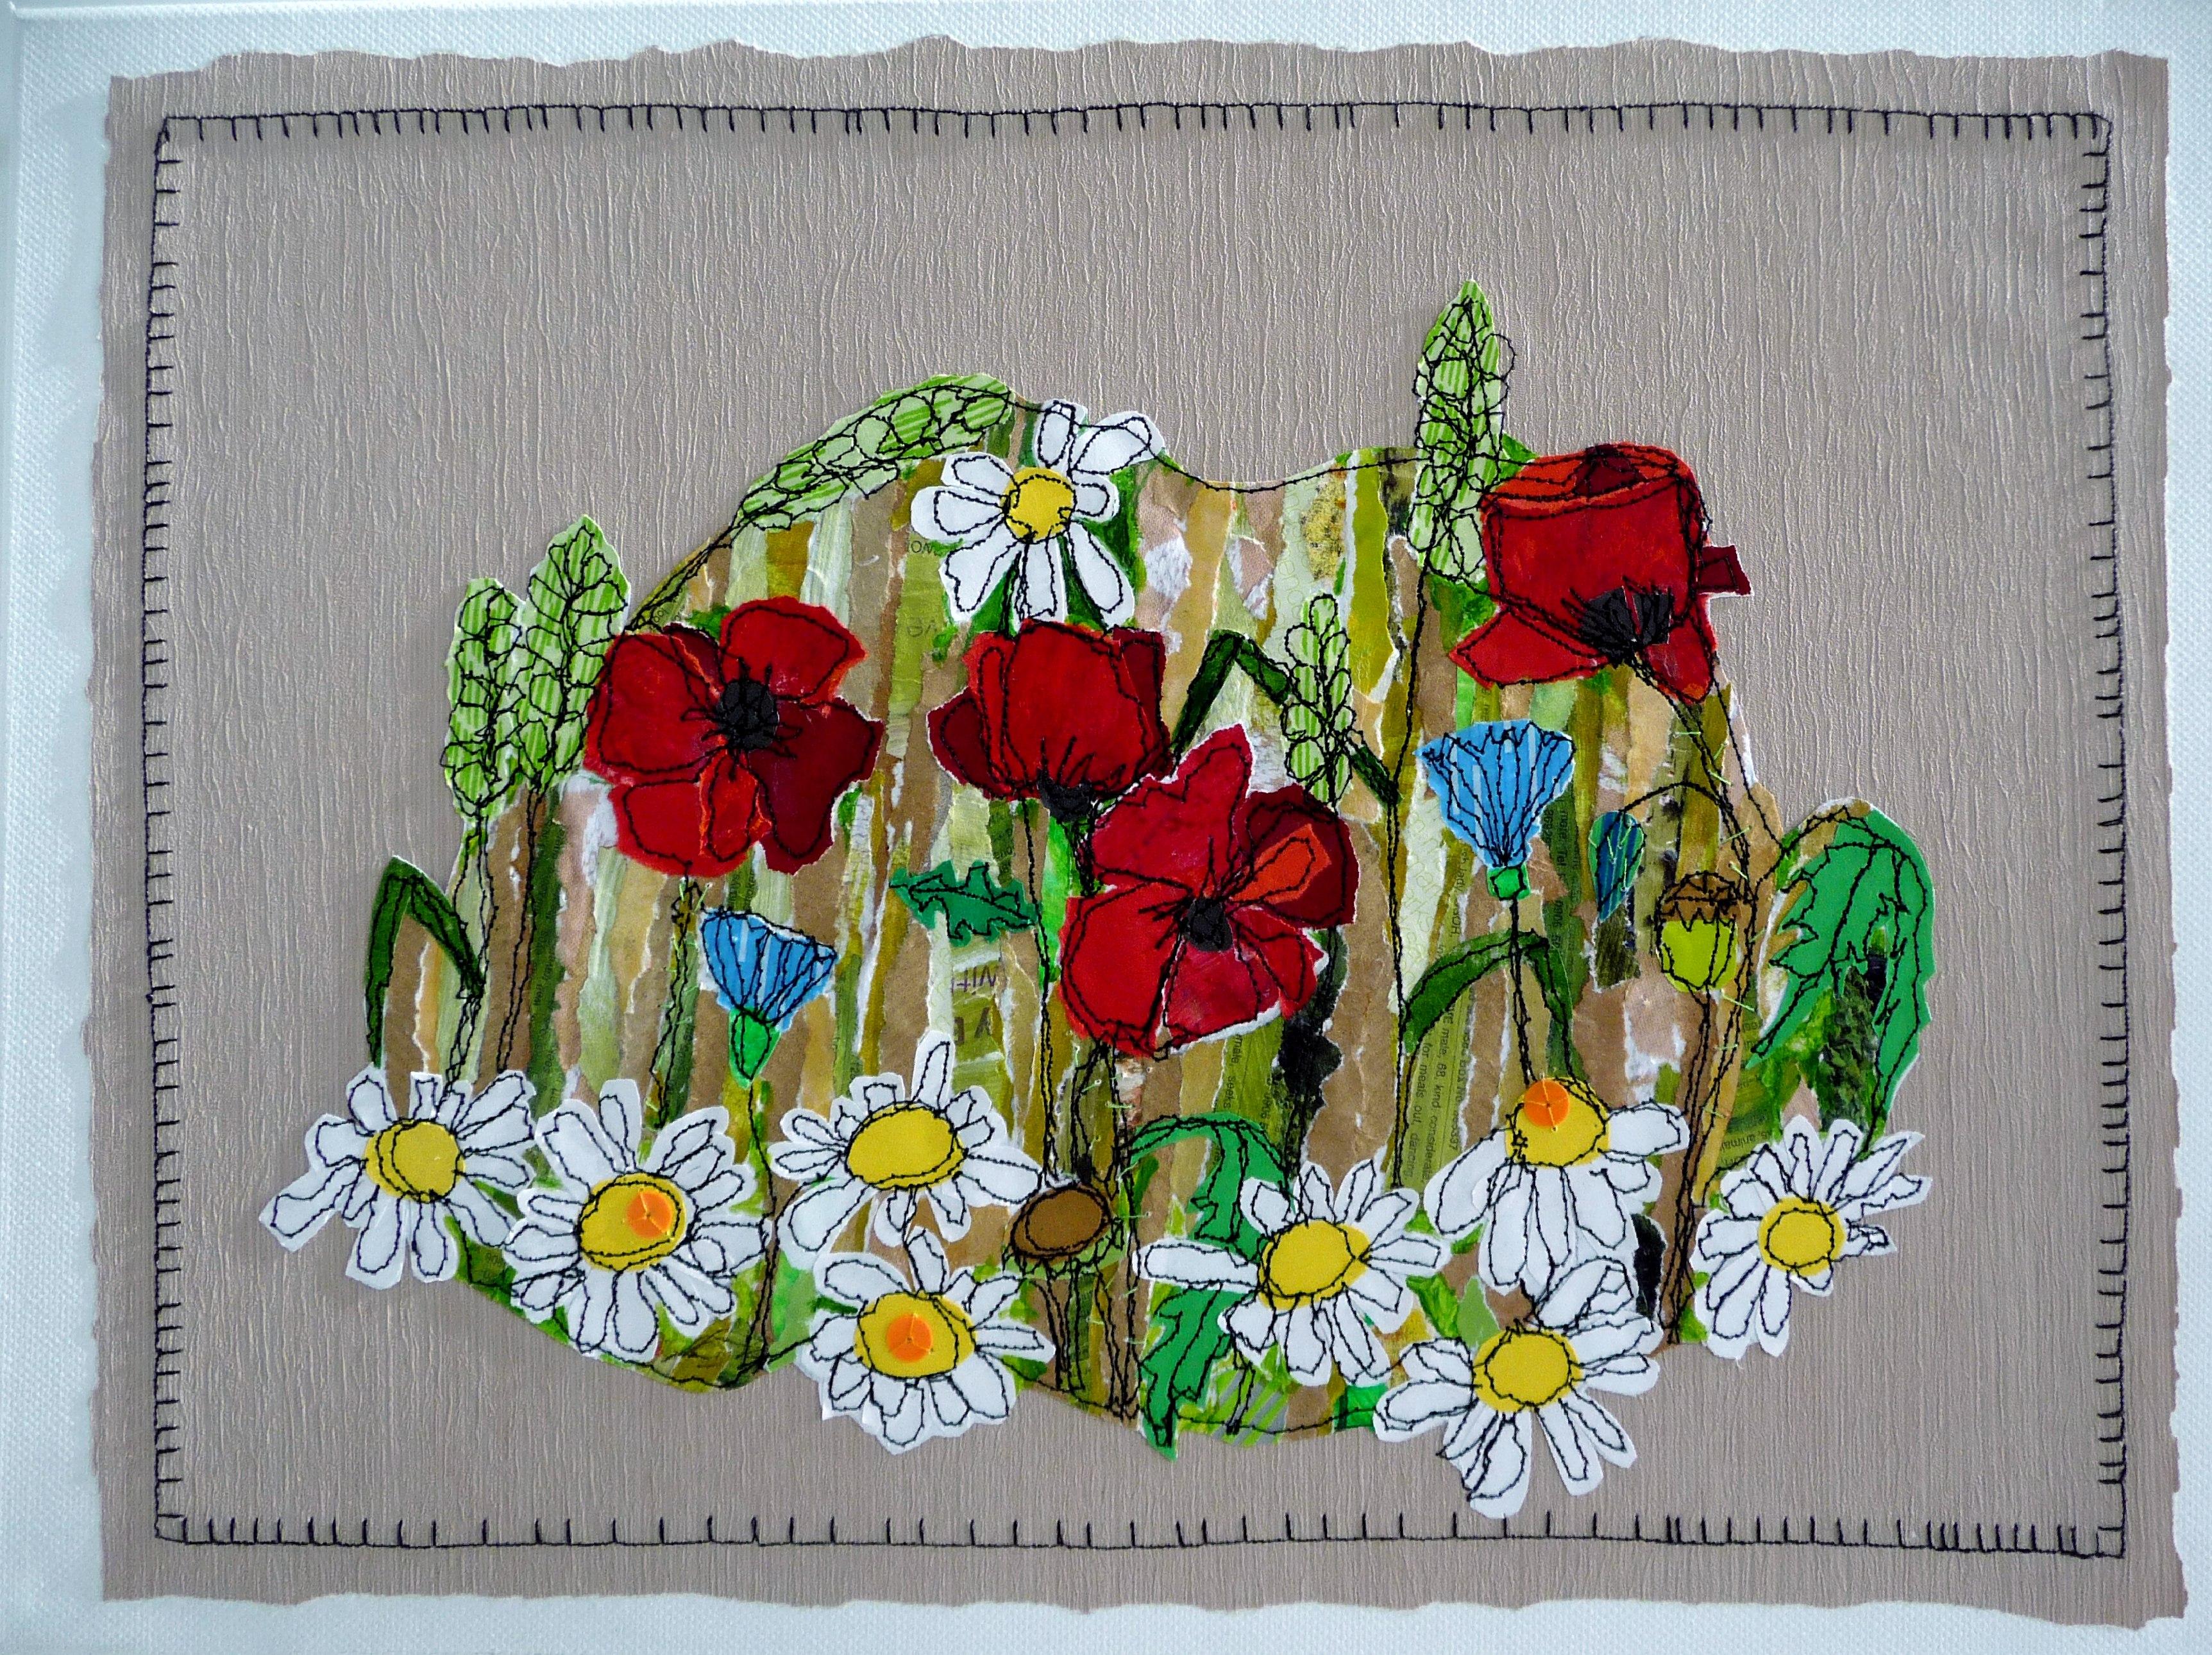 CORNFIELD by Sue Boardman, stitched paper